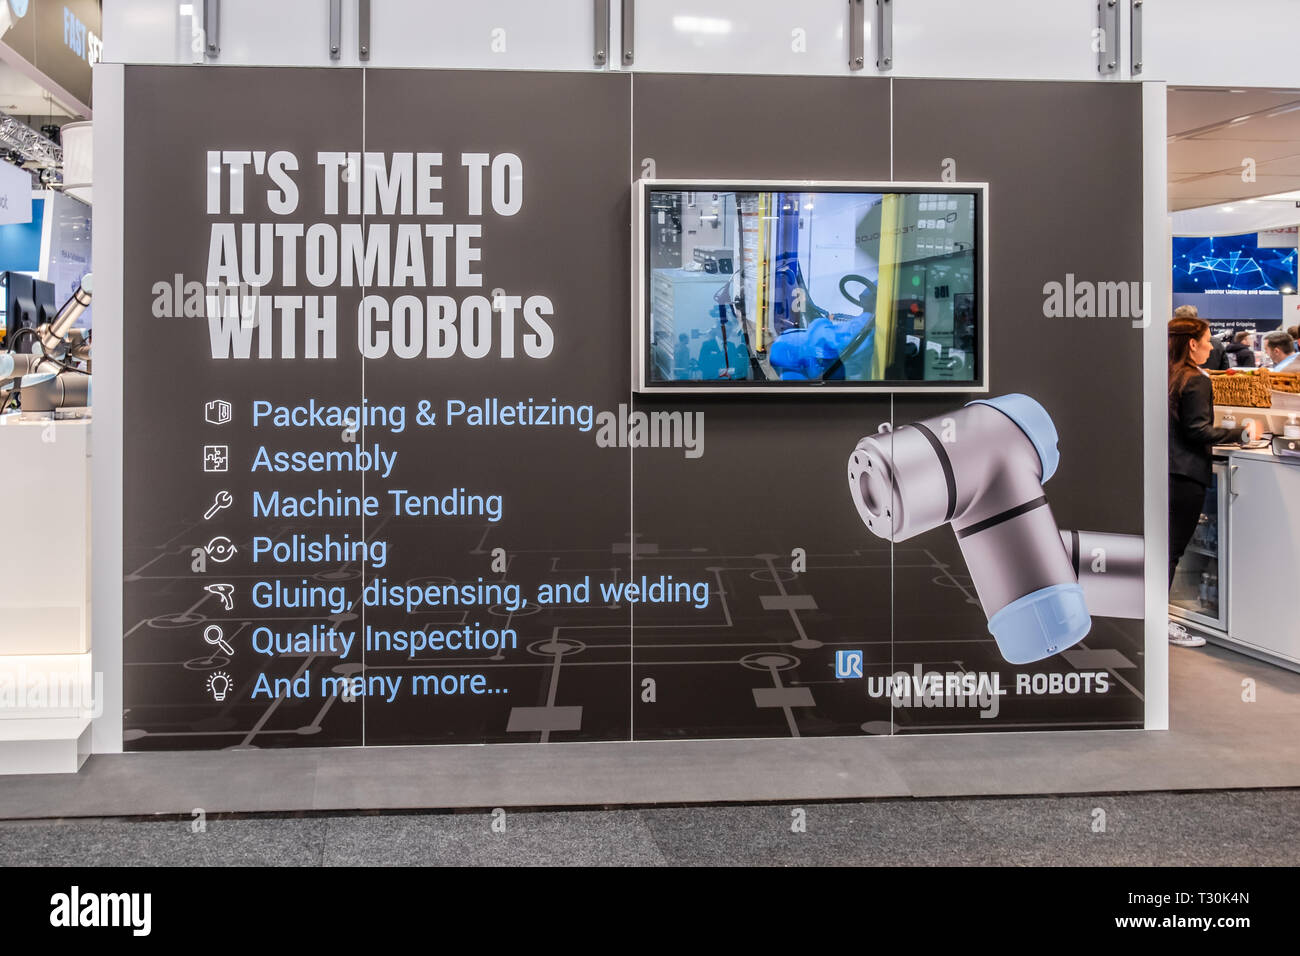 Universal Robots Stock Photos & Universal Robots Stock Images - Alamy